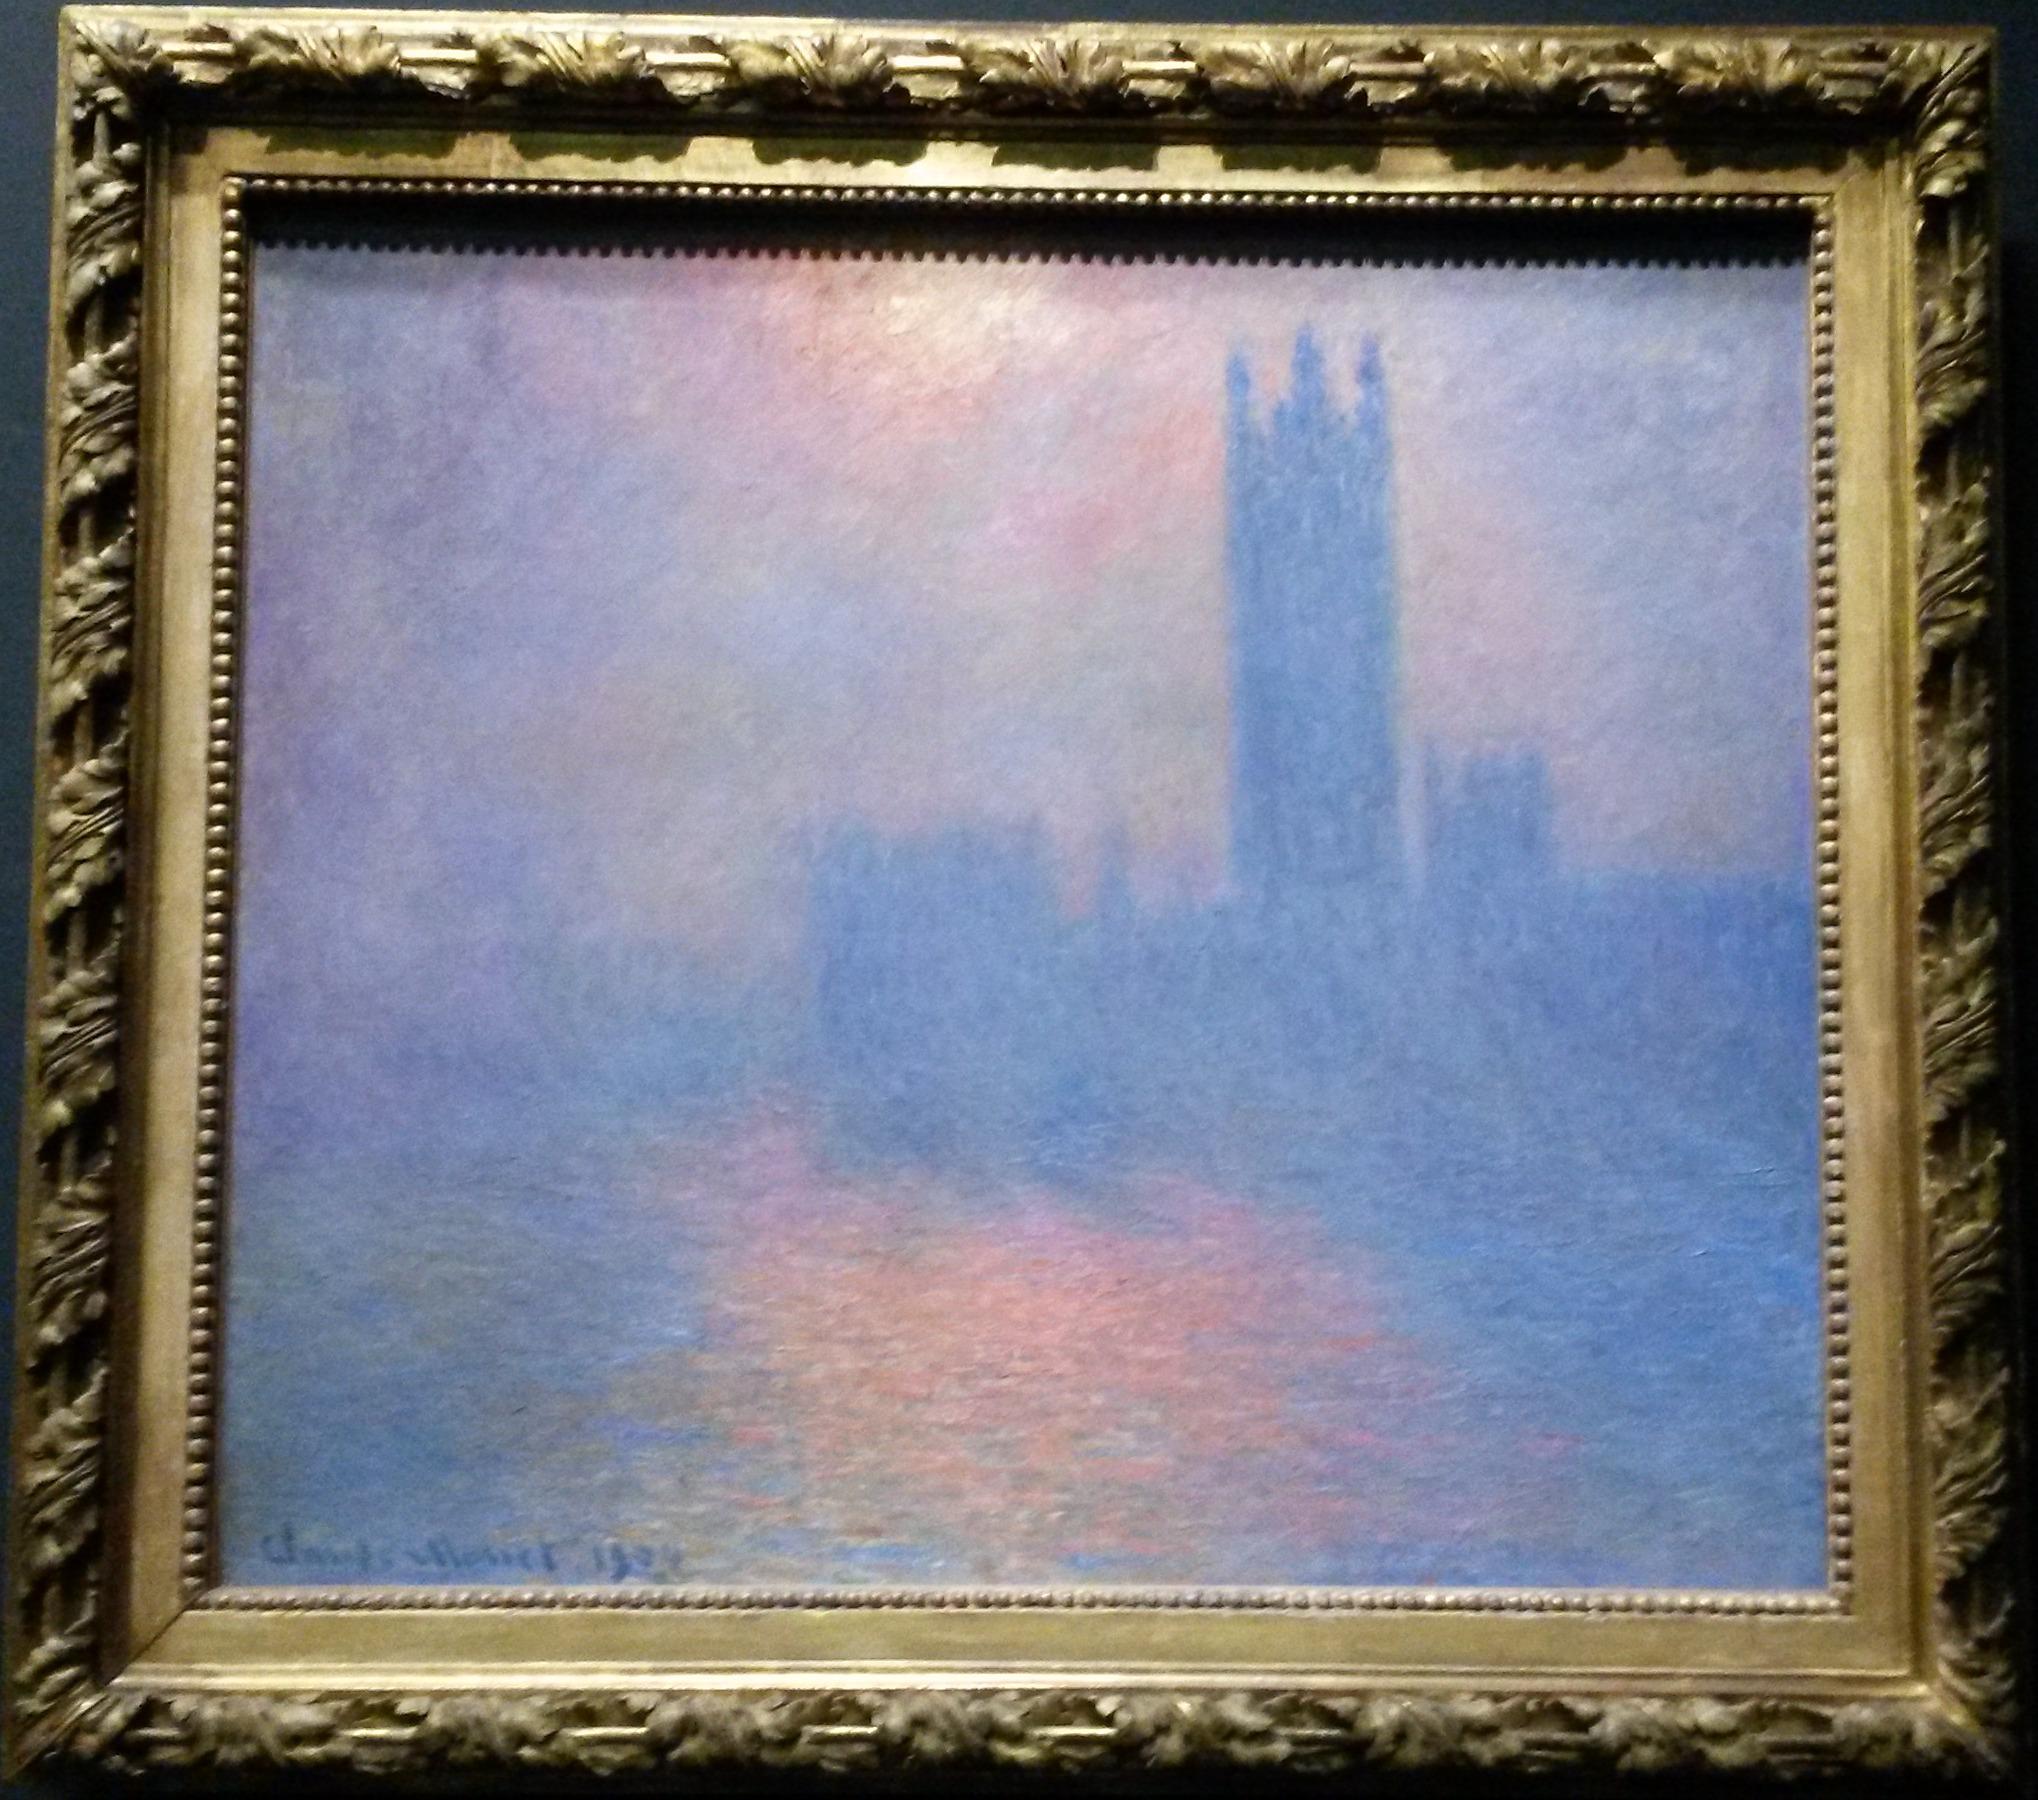 O Parlamento de Londres. Efeito do sol sobre a névoa